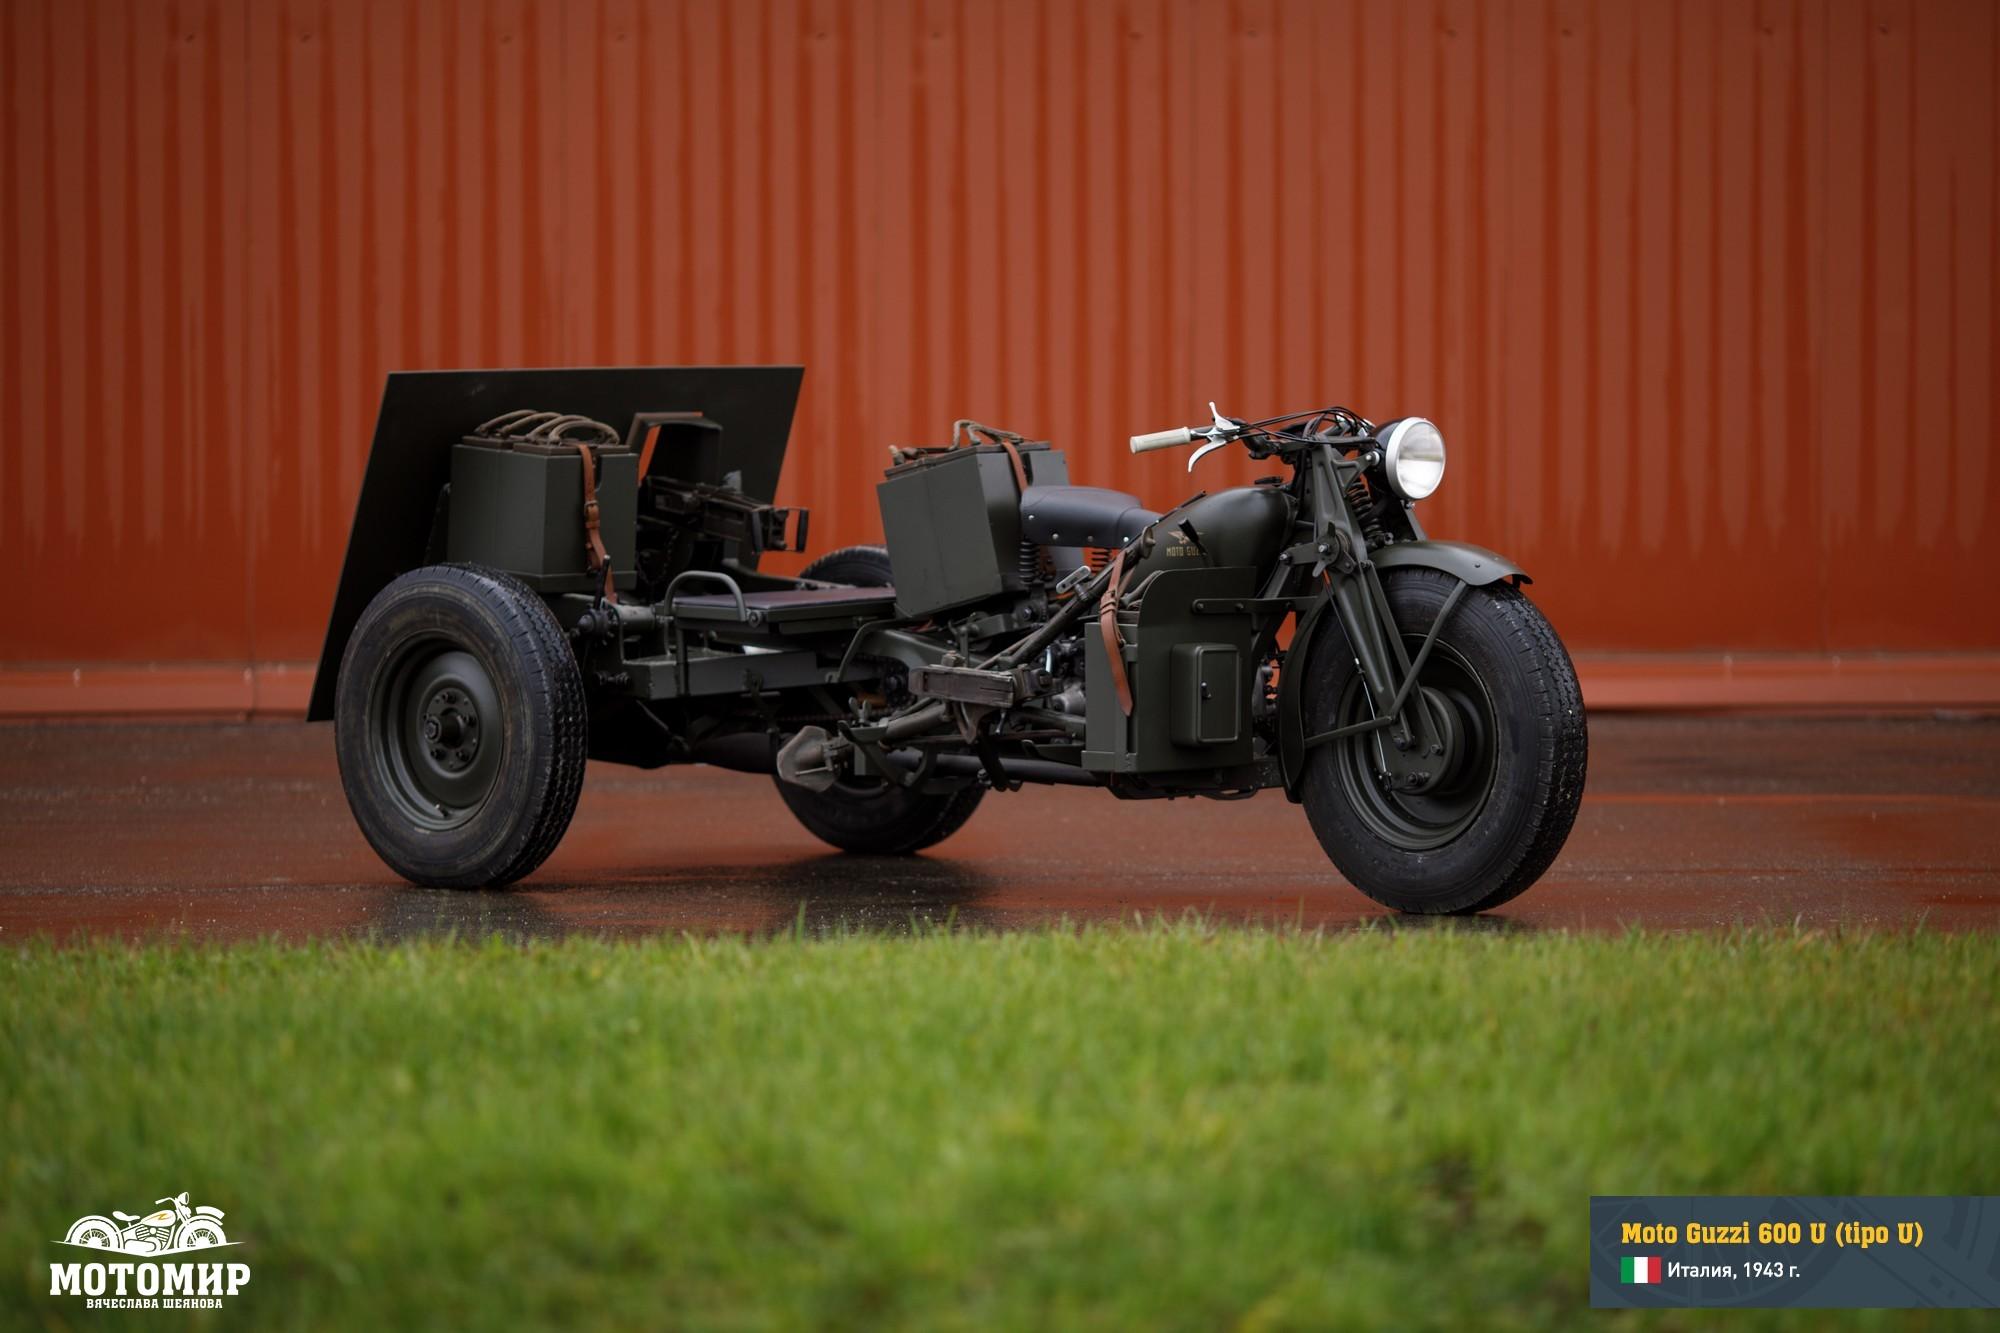 moto-guzzi-600-u-web-07